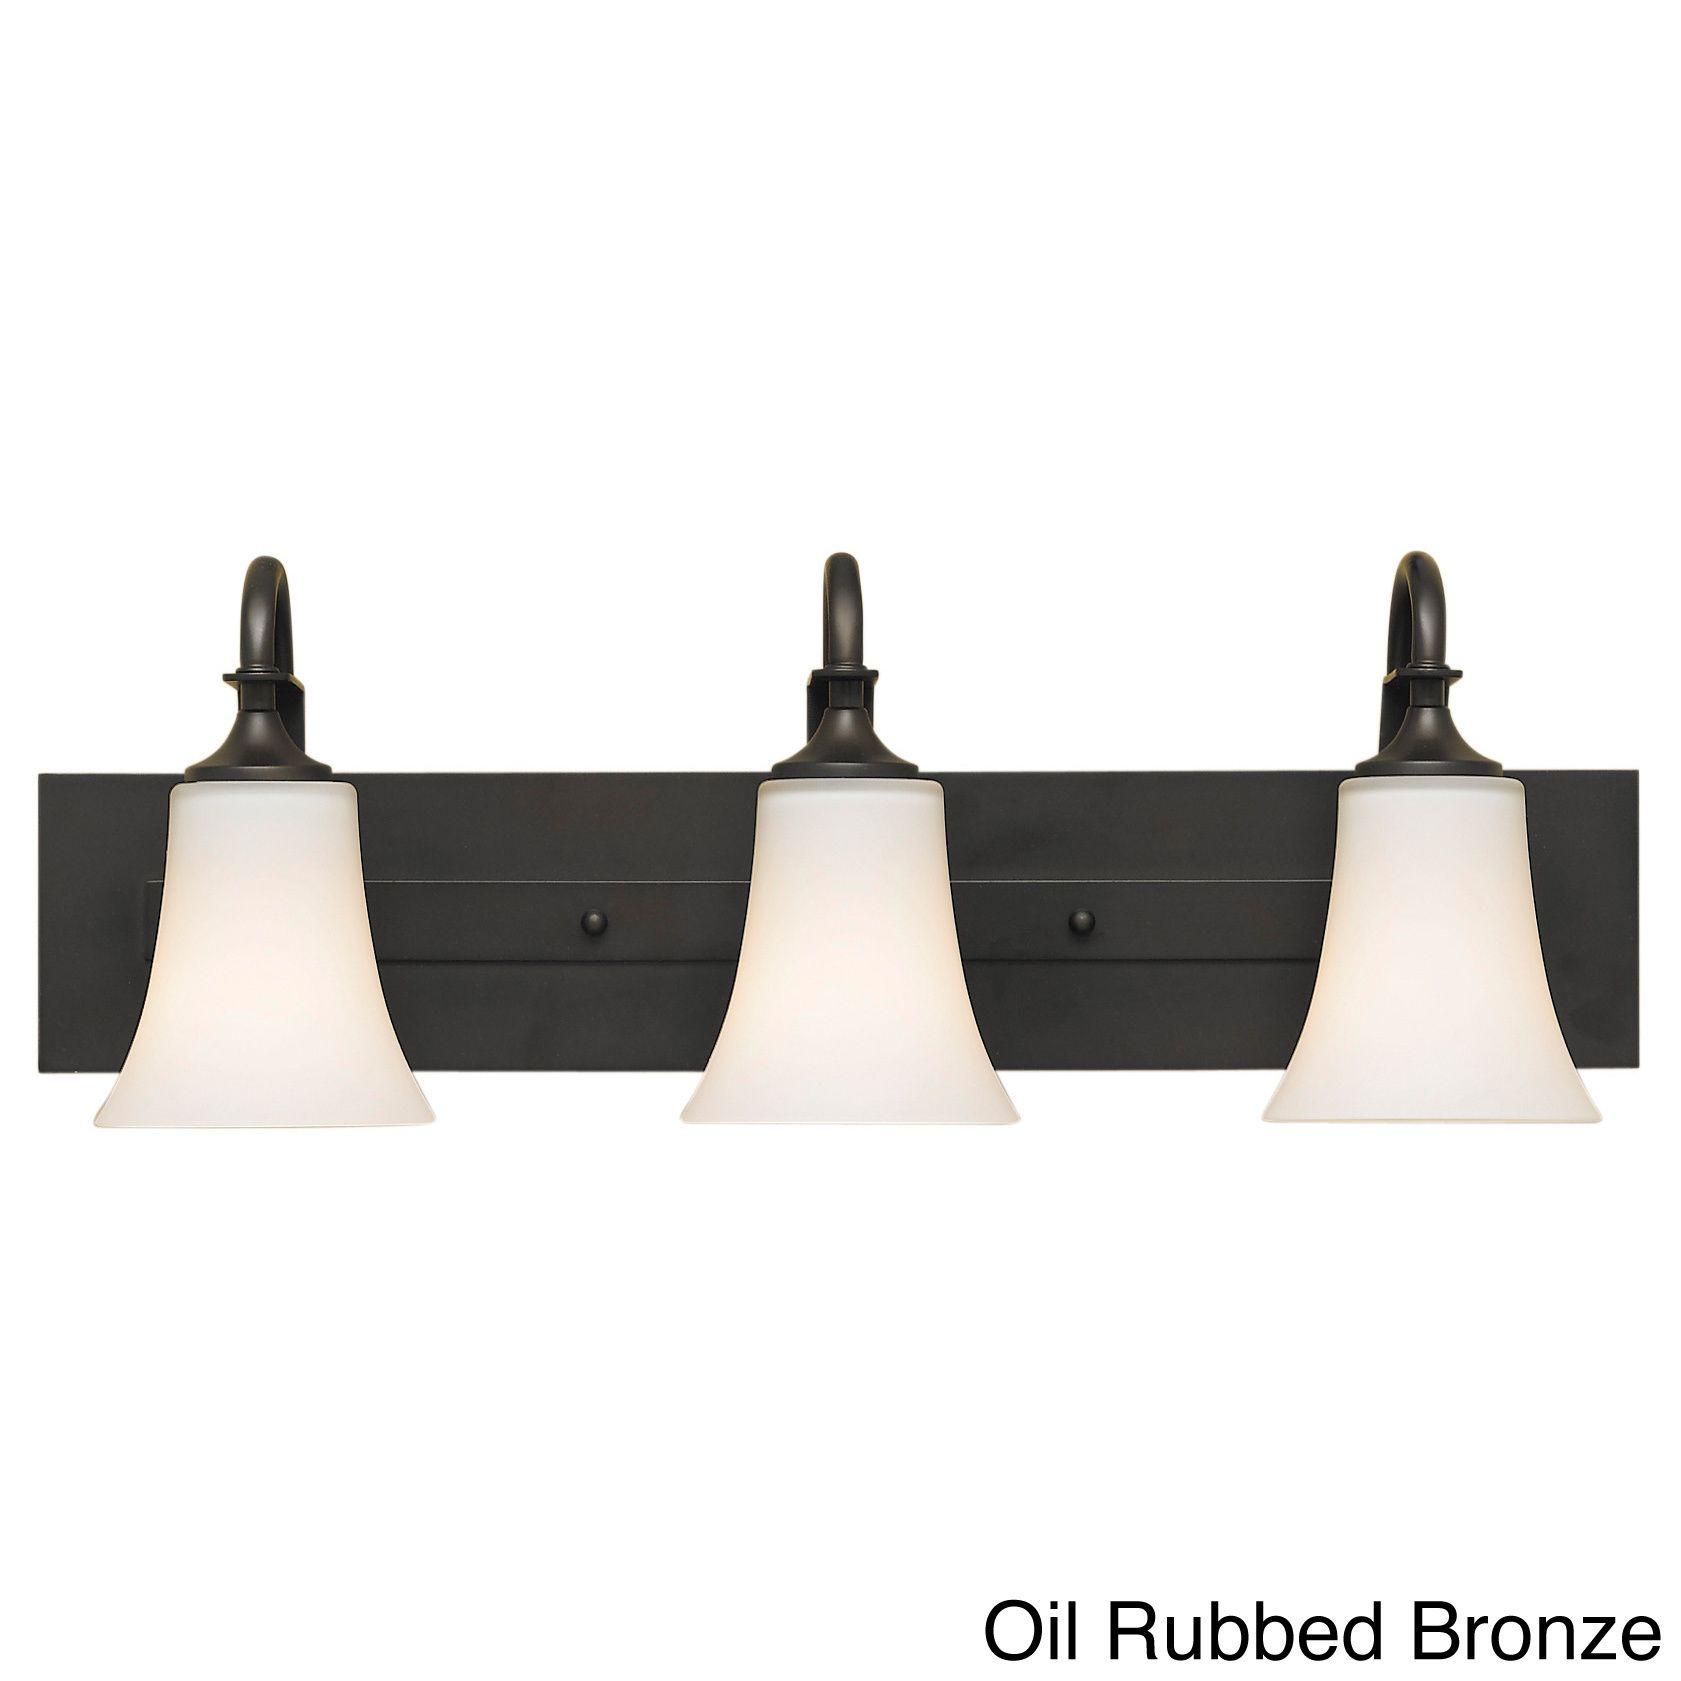 Moen Yb2263orb Brantford Oil Rubbed Bronze Bathroom Lighting Lighting Efaucets Com Maybe For Lighting In Bathrooms Vanity Lighting Bathroom Light Fixtures Bathroom Lighting